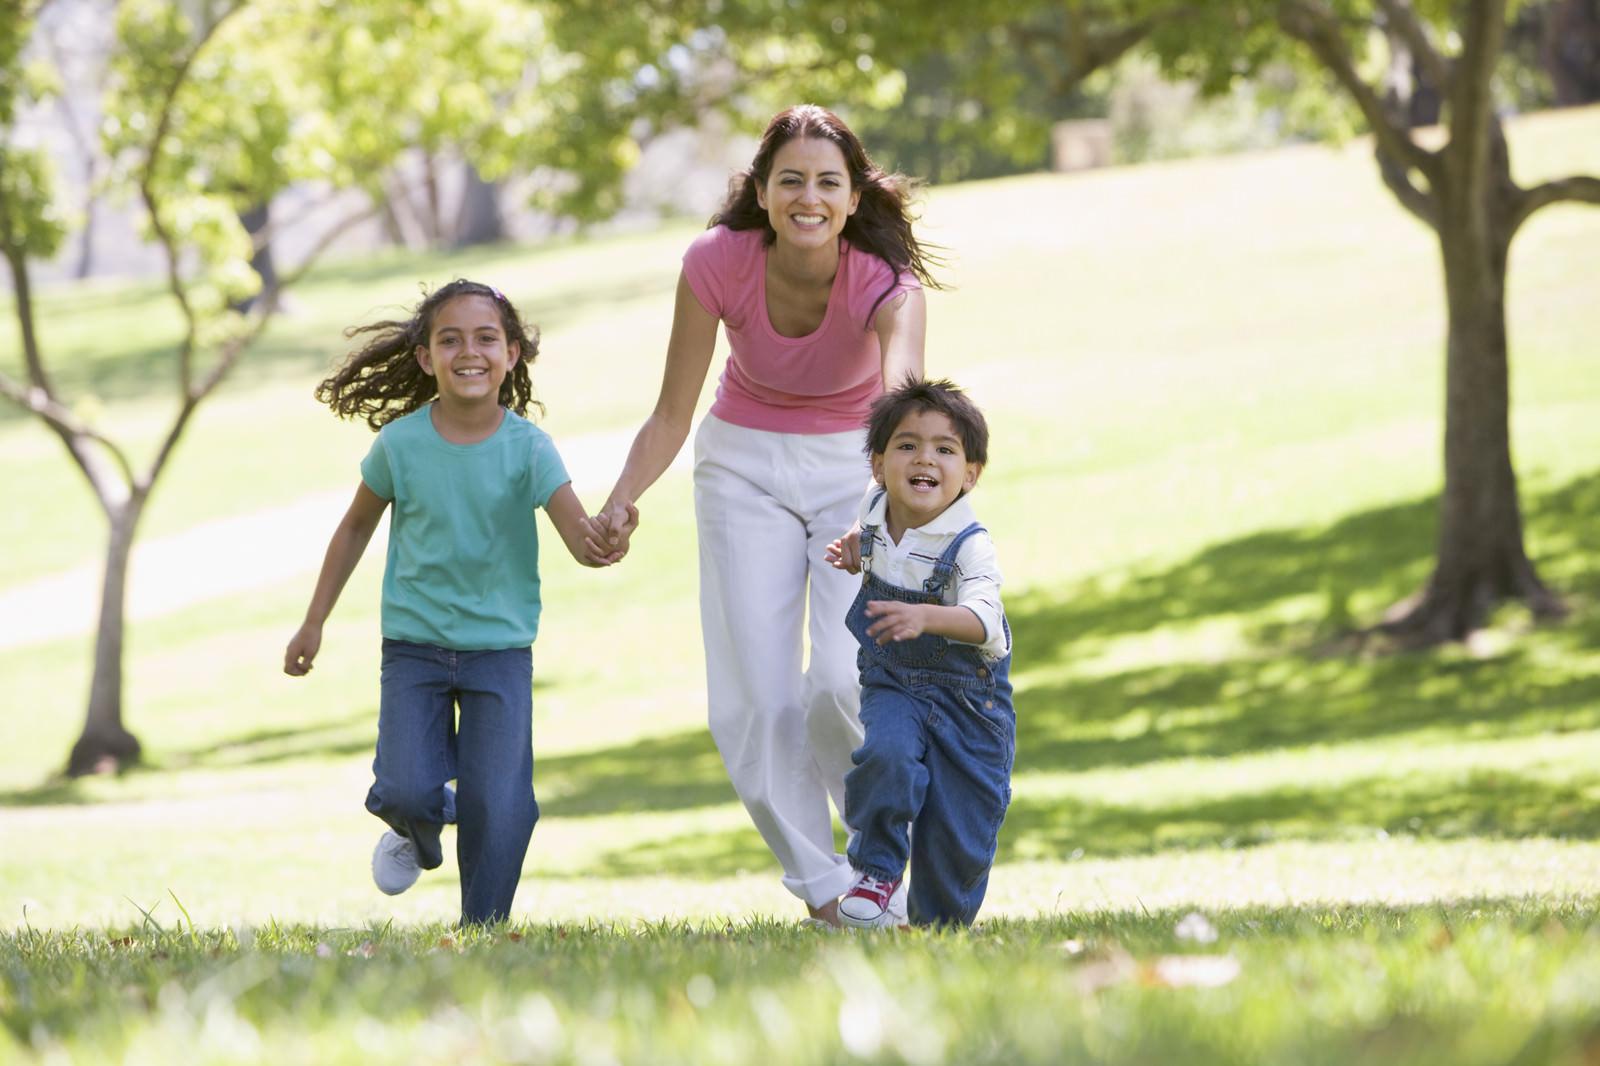 mom-and-kids-at-play